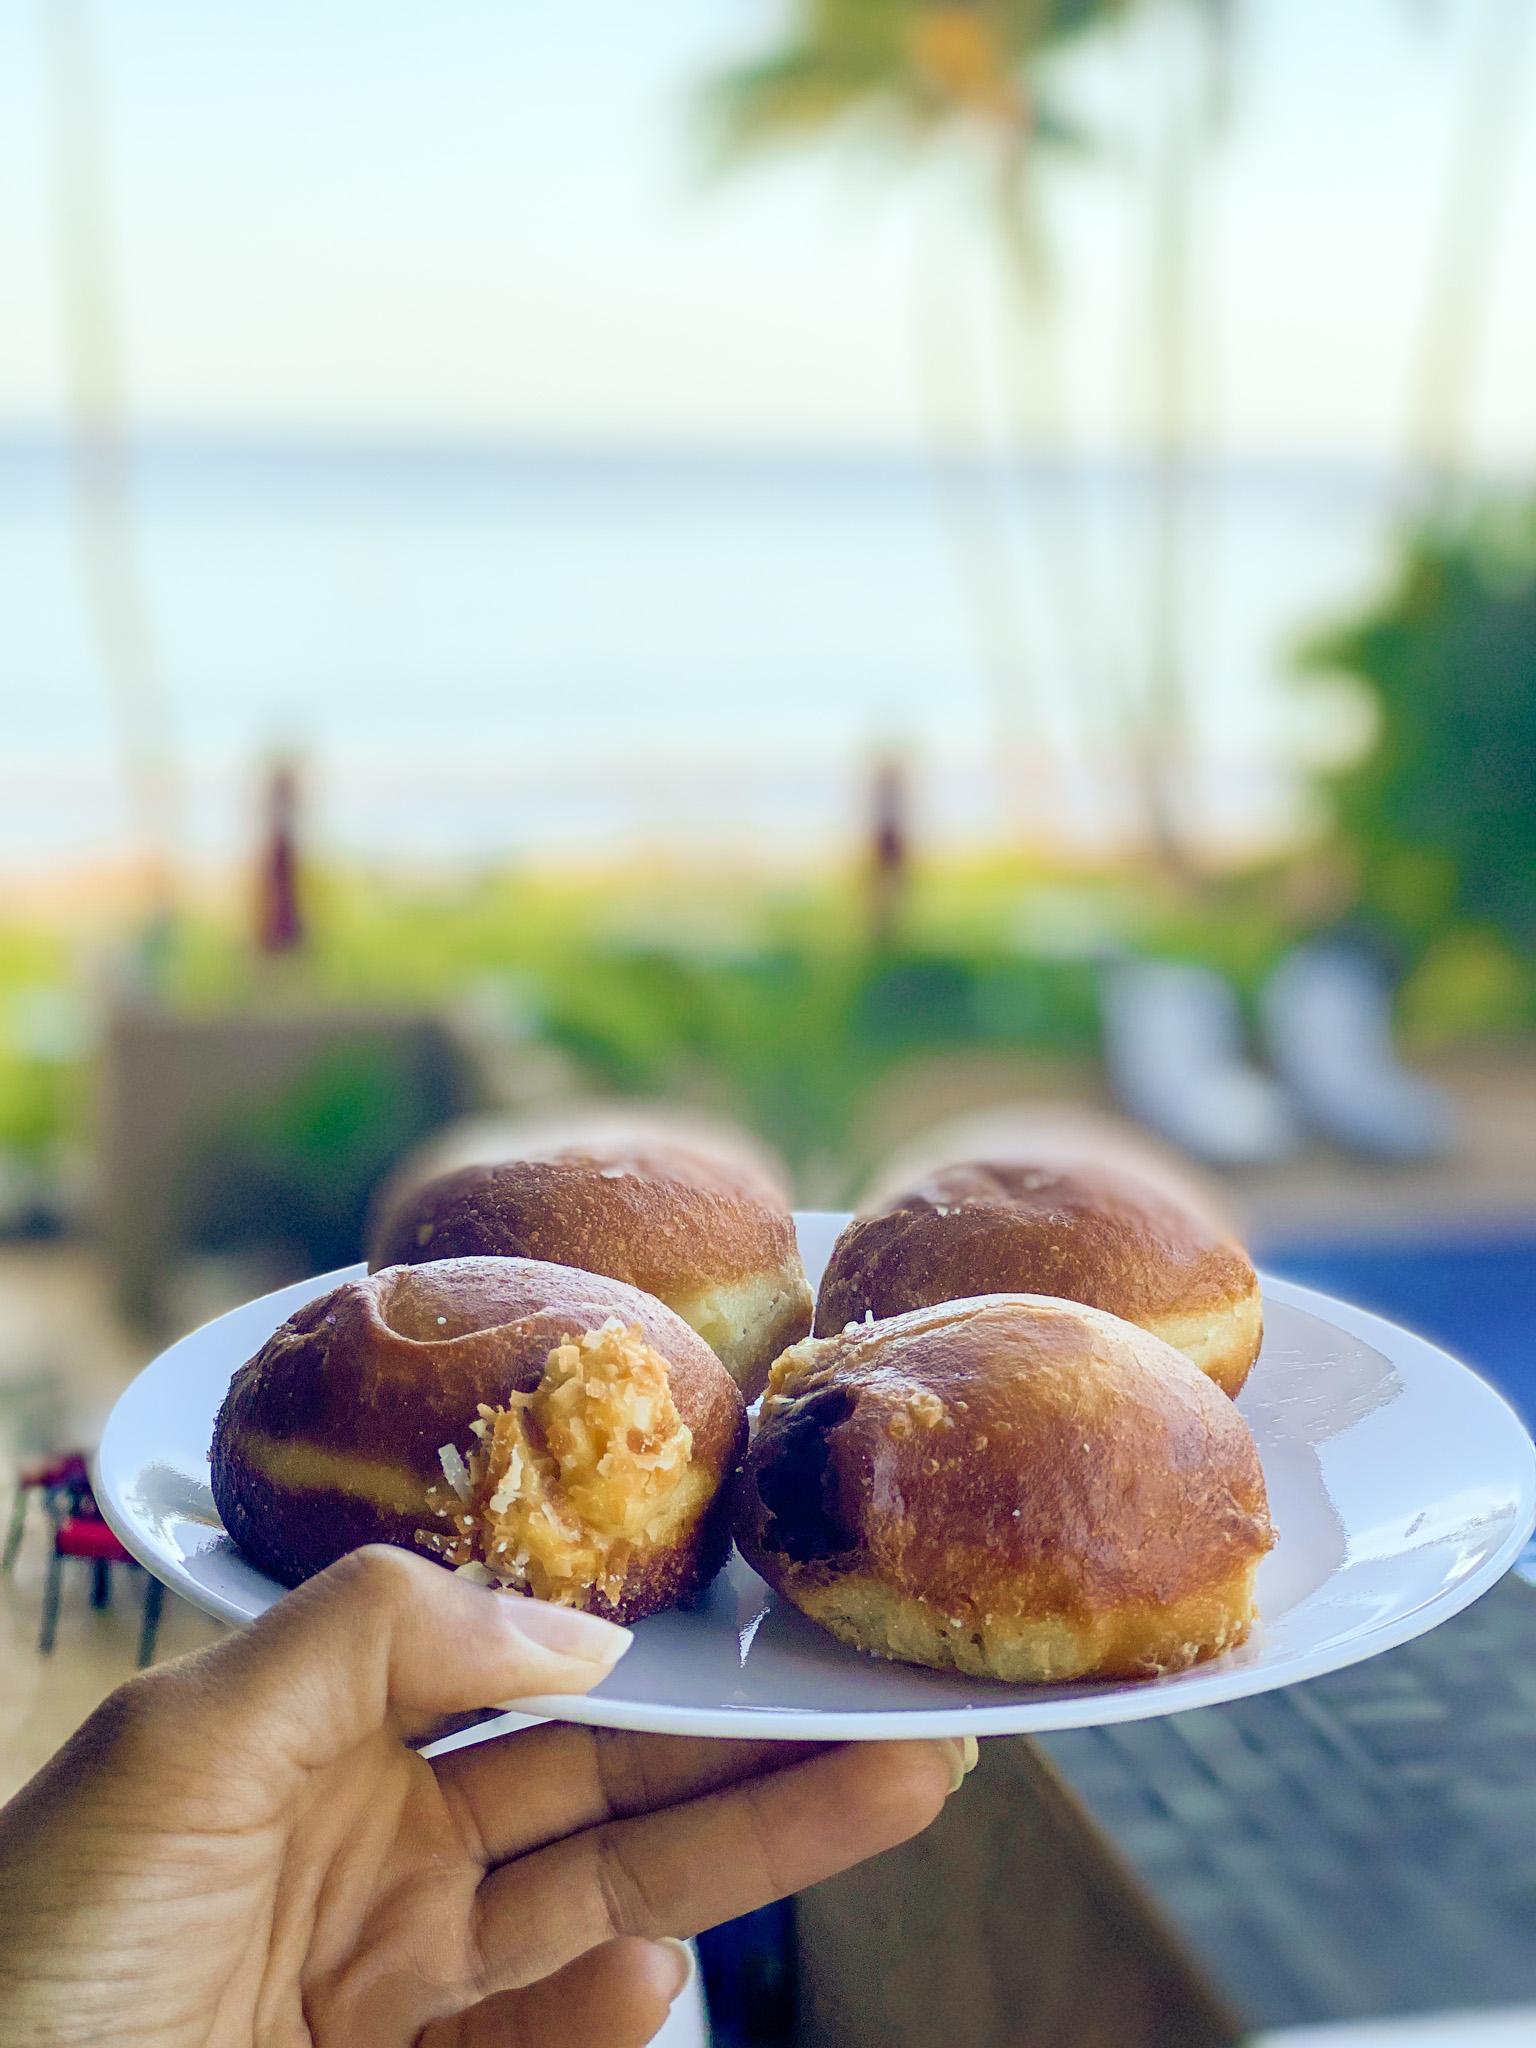 traveling to hawaii maui, where to eat in maui, food trucks in maui Hawaii, Sugar Beach Bake Shop